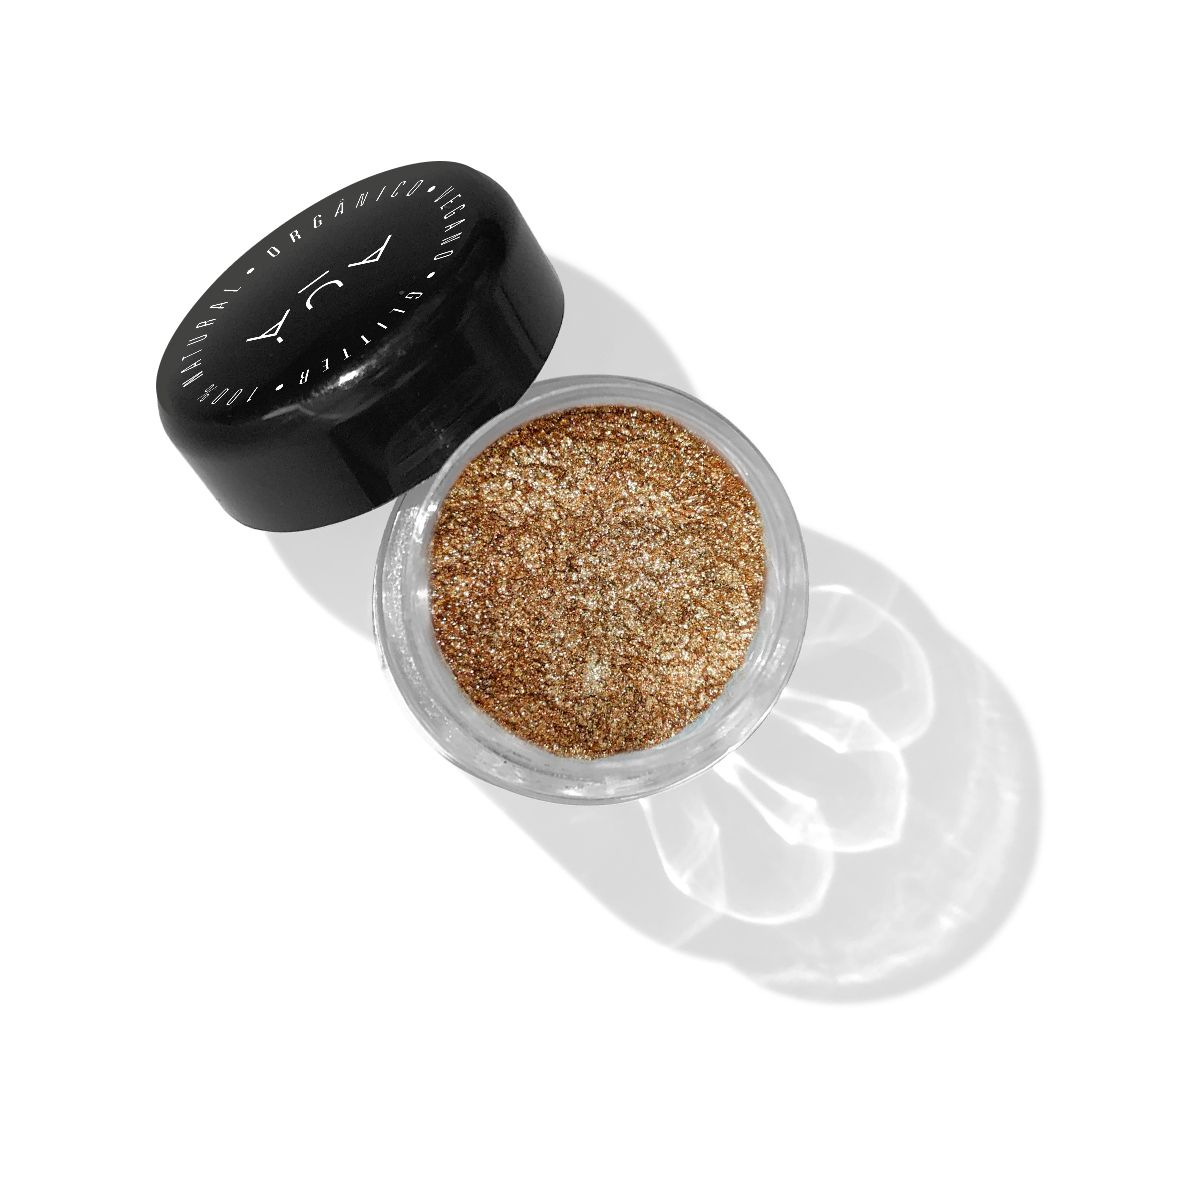 Kit Limpeza Profunda Antioleosidade + Disco de Crochê + Glitters